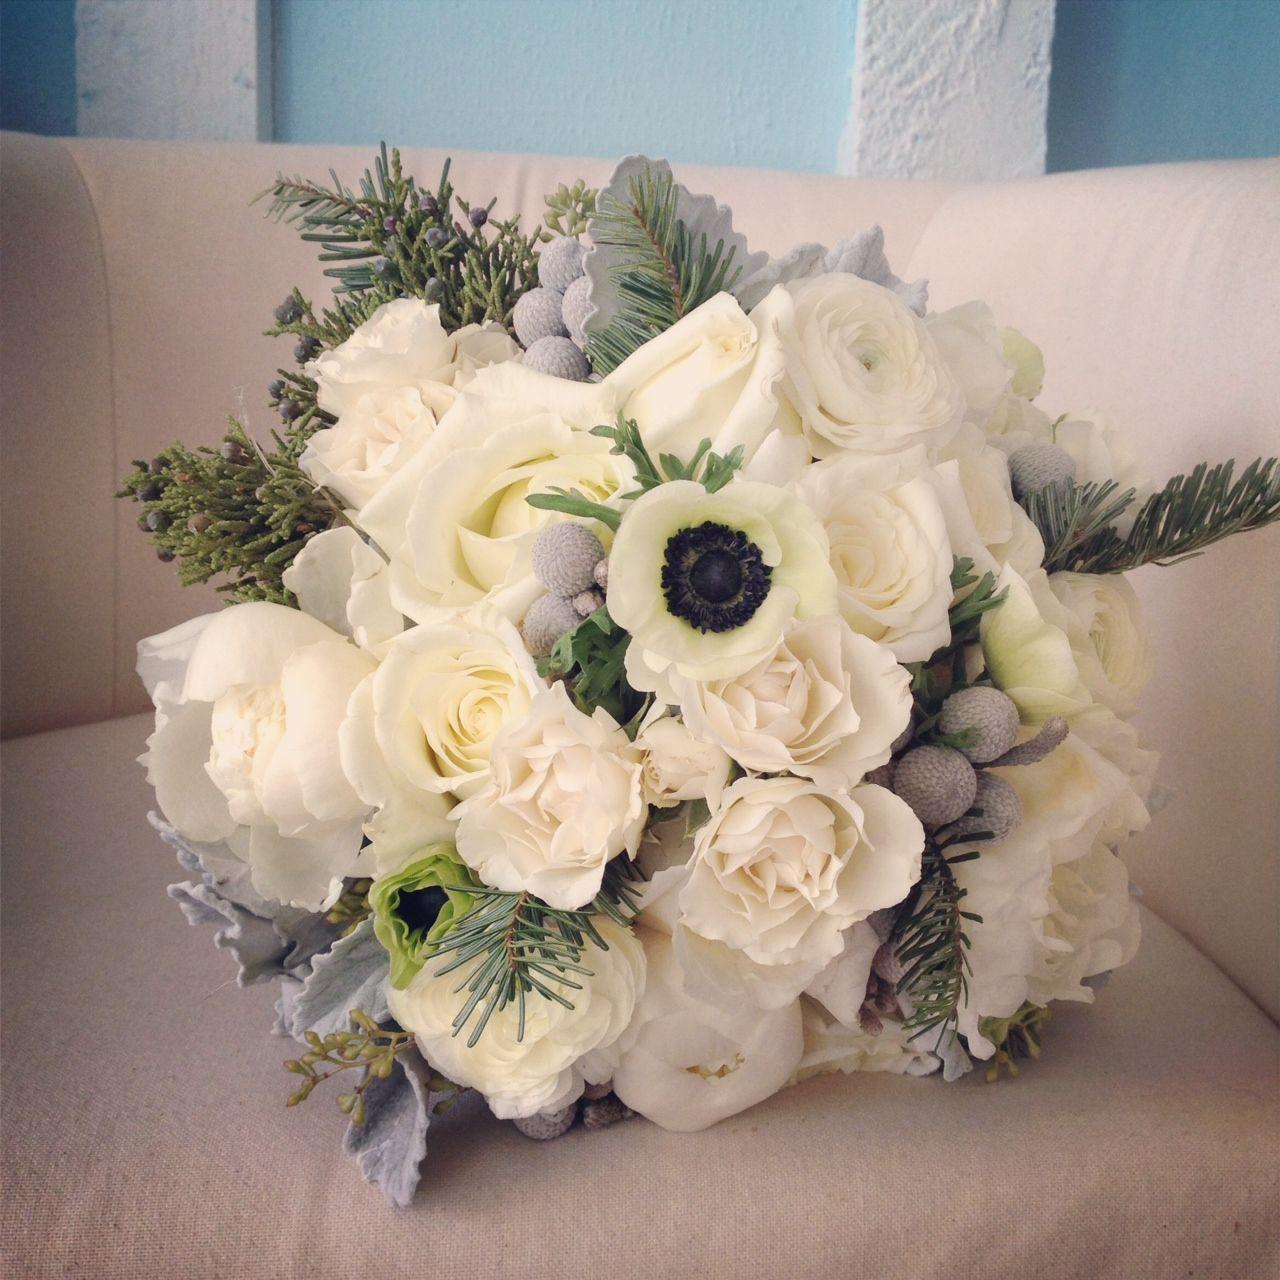 Winter white wedding bouquet of anemones garden roses silver fir winter white wedding bouquet of anemones garden roses silver fir blue berried juniper mightylinksfo